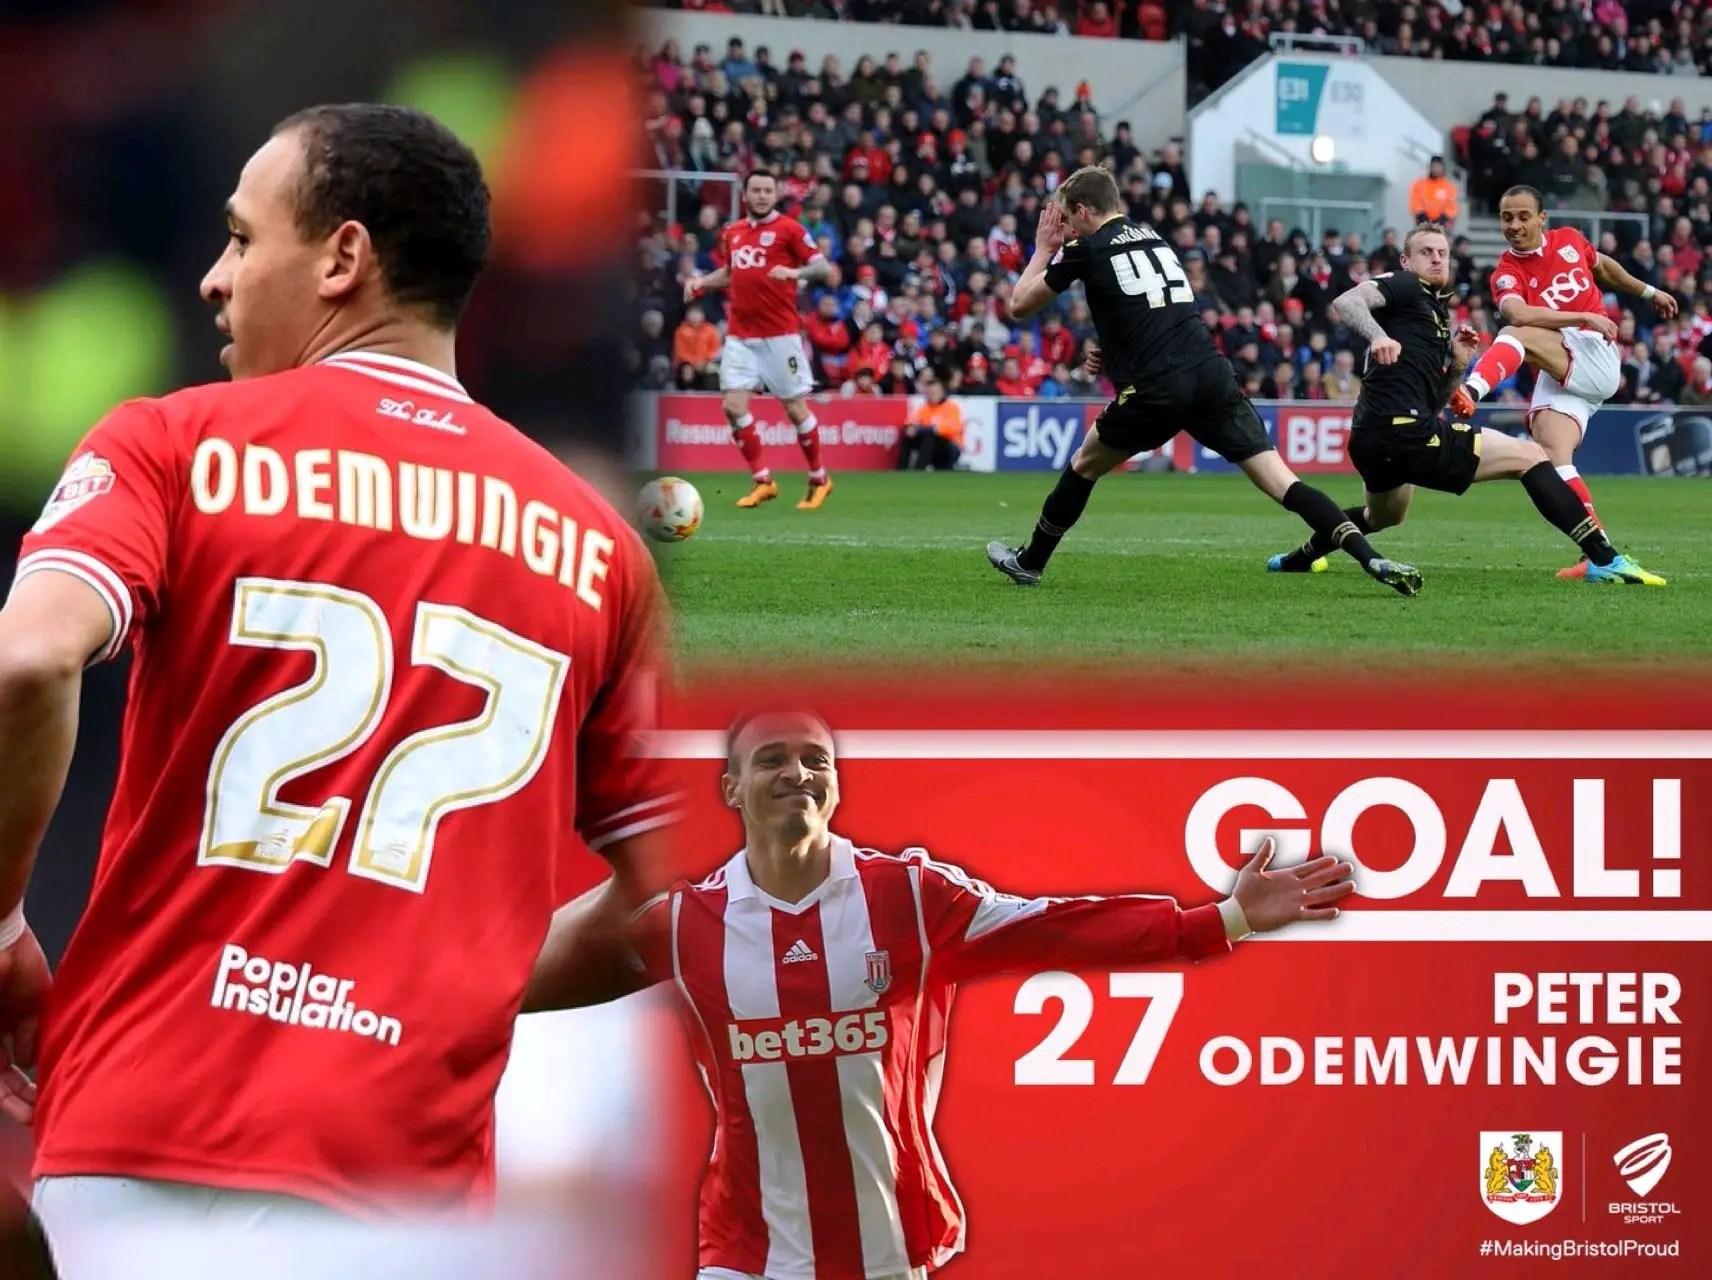 Odemwingie Celebrates Home Debut Goal For Bristol City